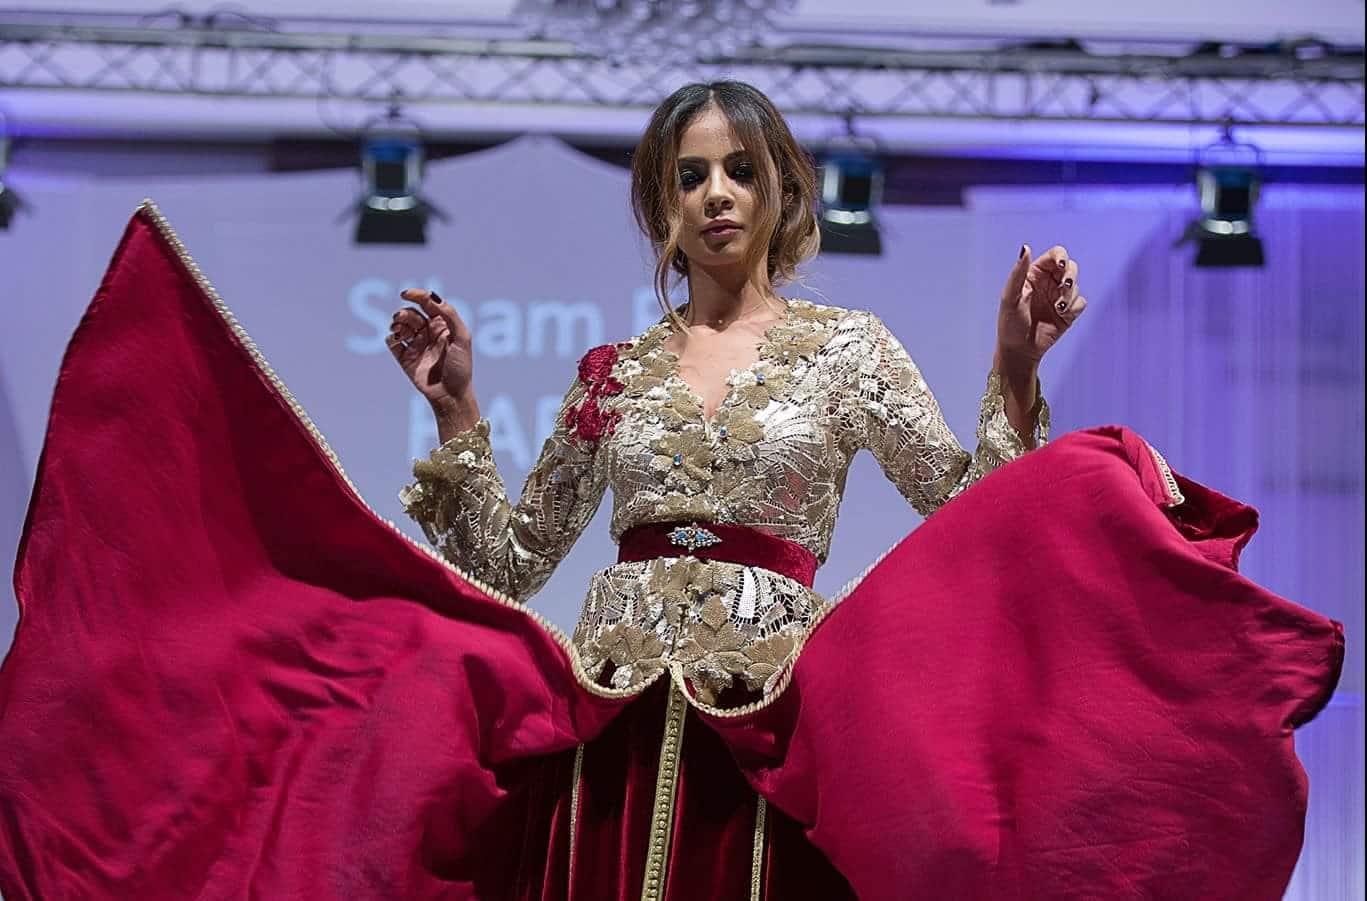 Caftan and Luxury: le Maroc qui inspire